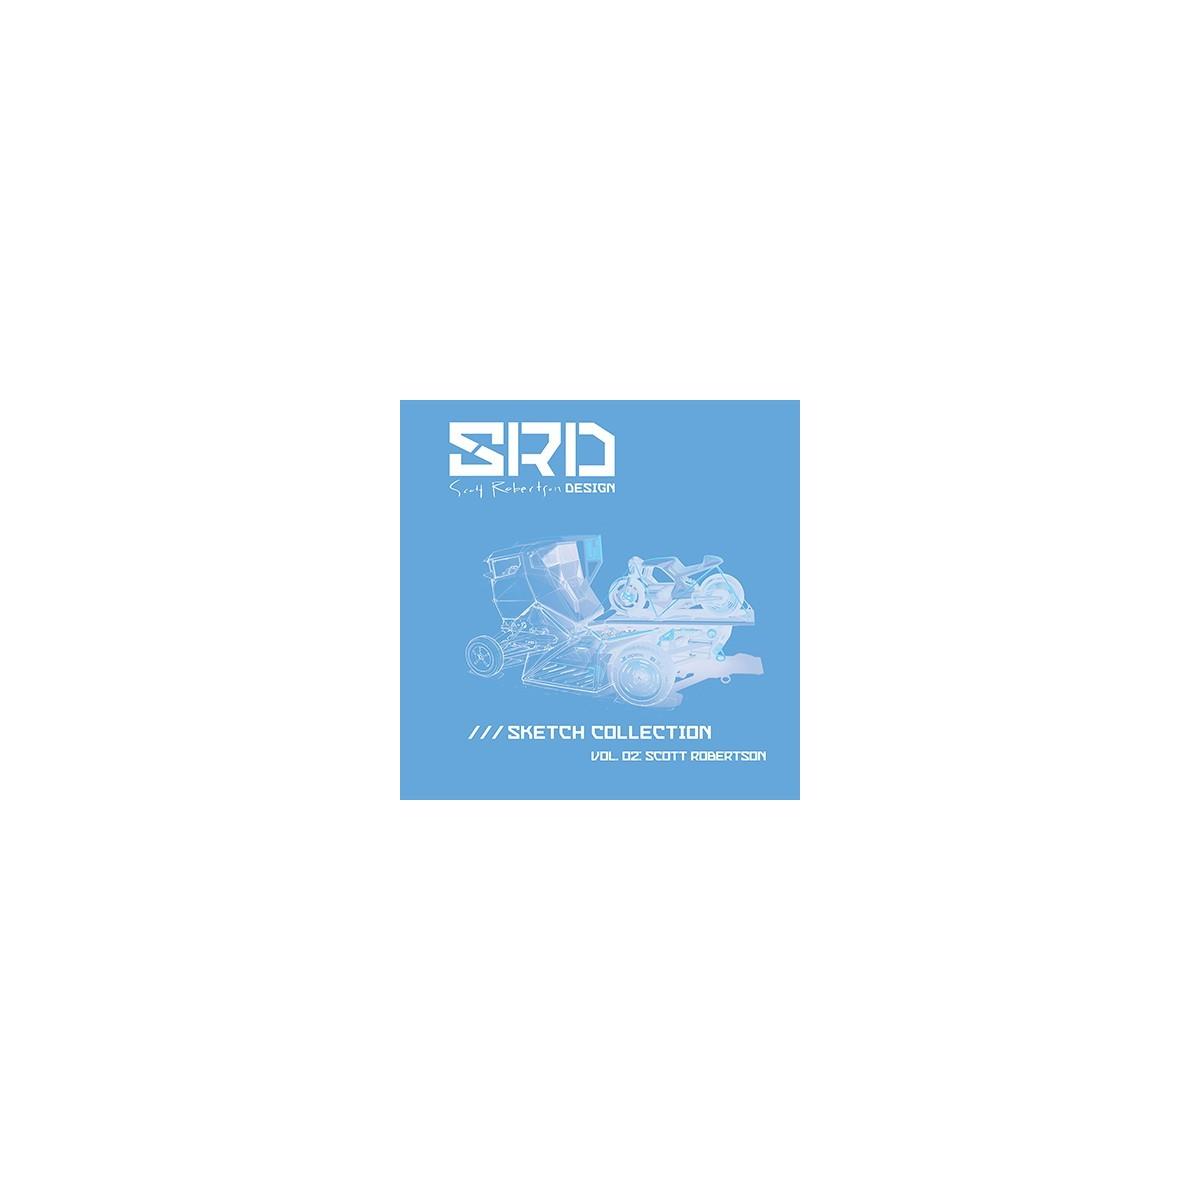 Scott Robertson - SRD Sketch Collection 02